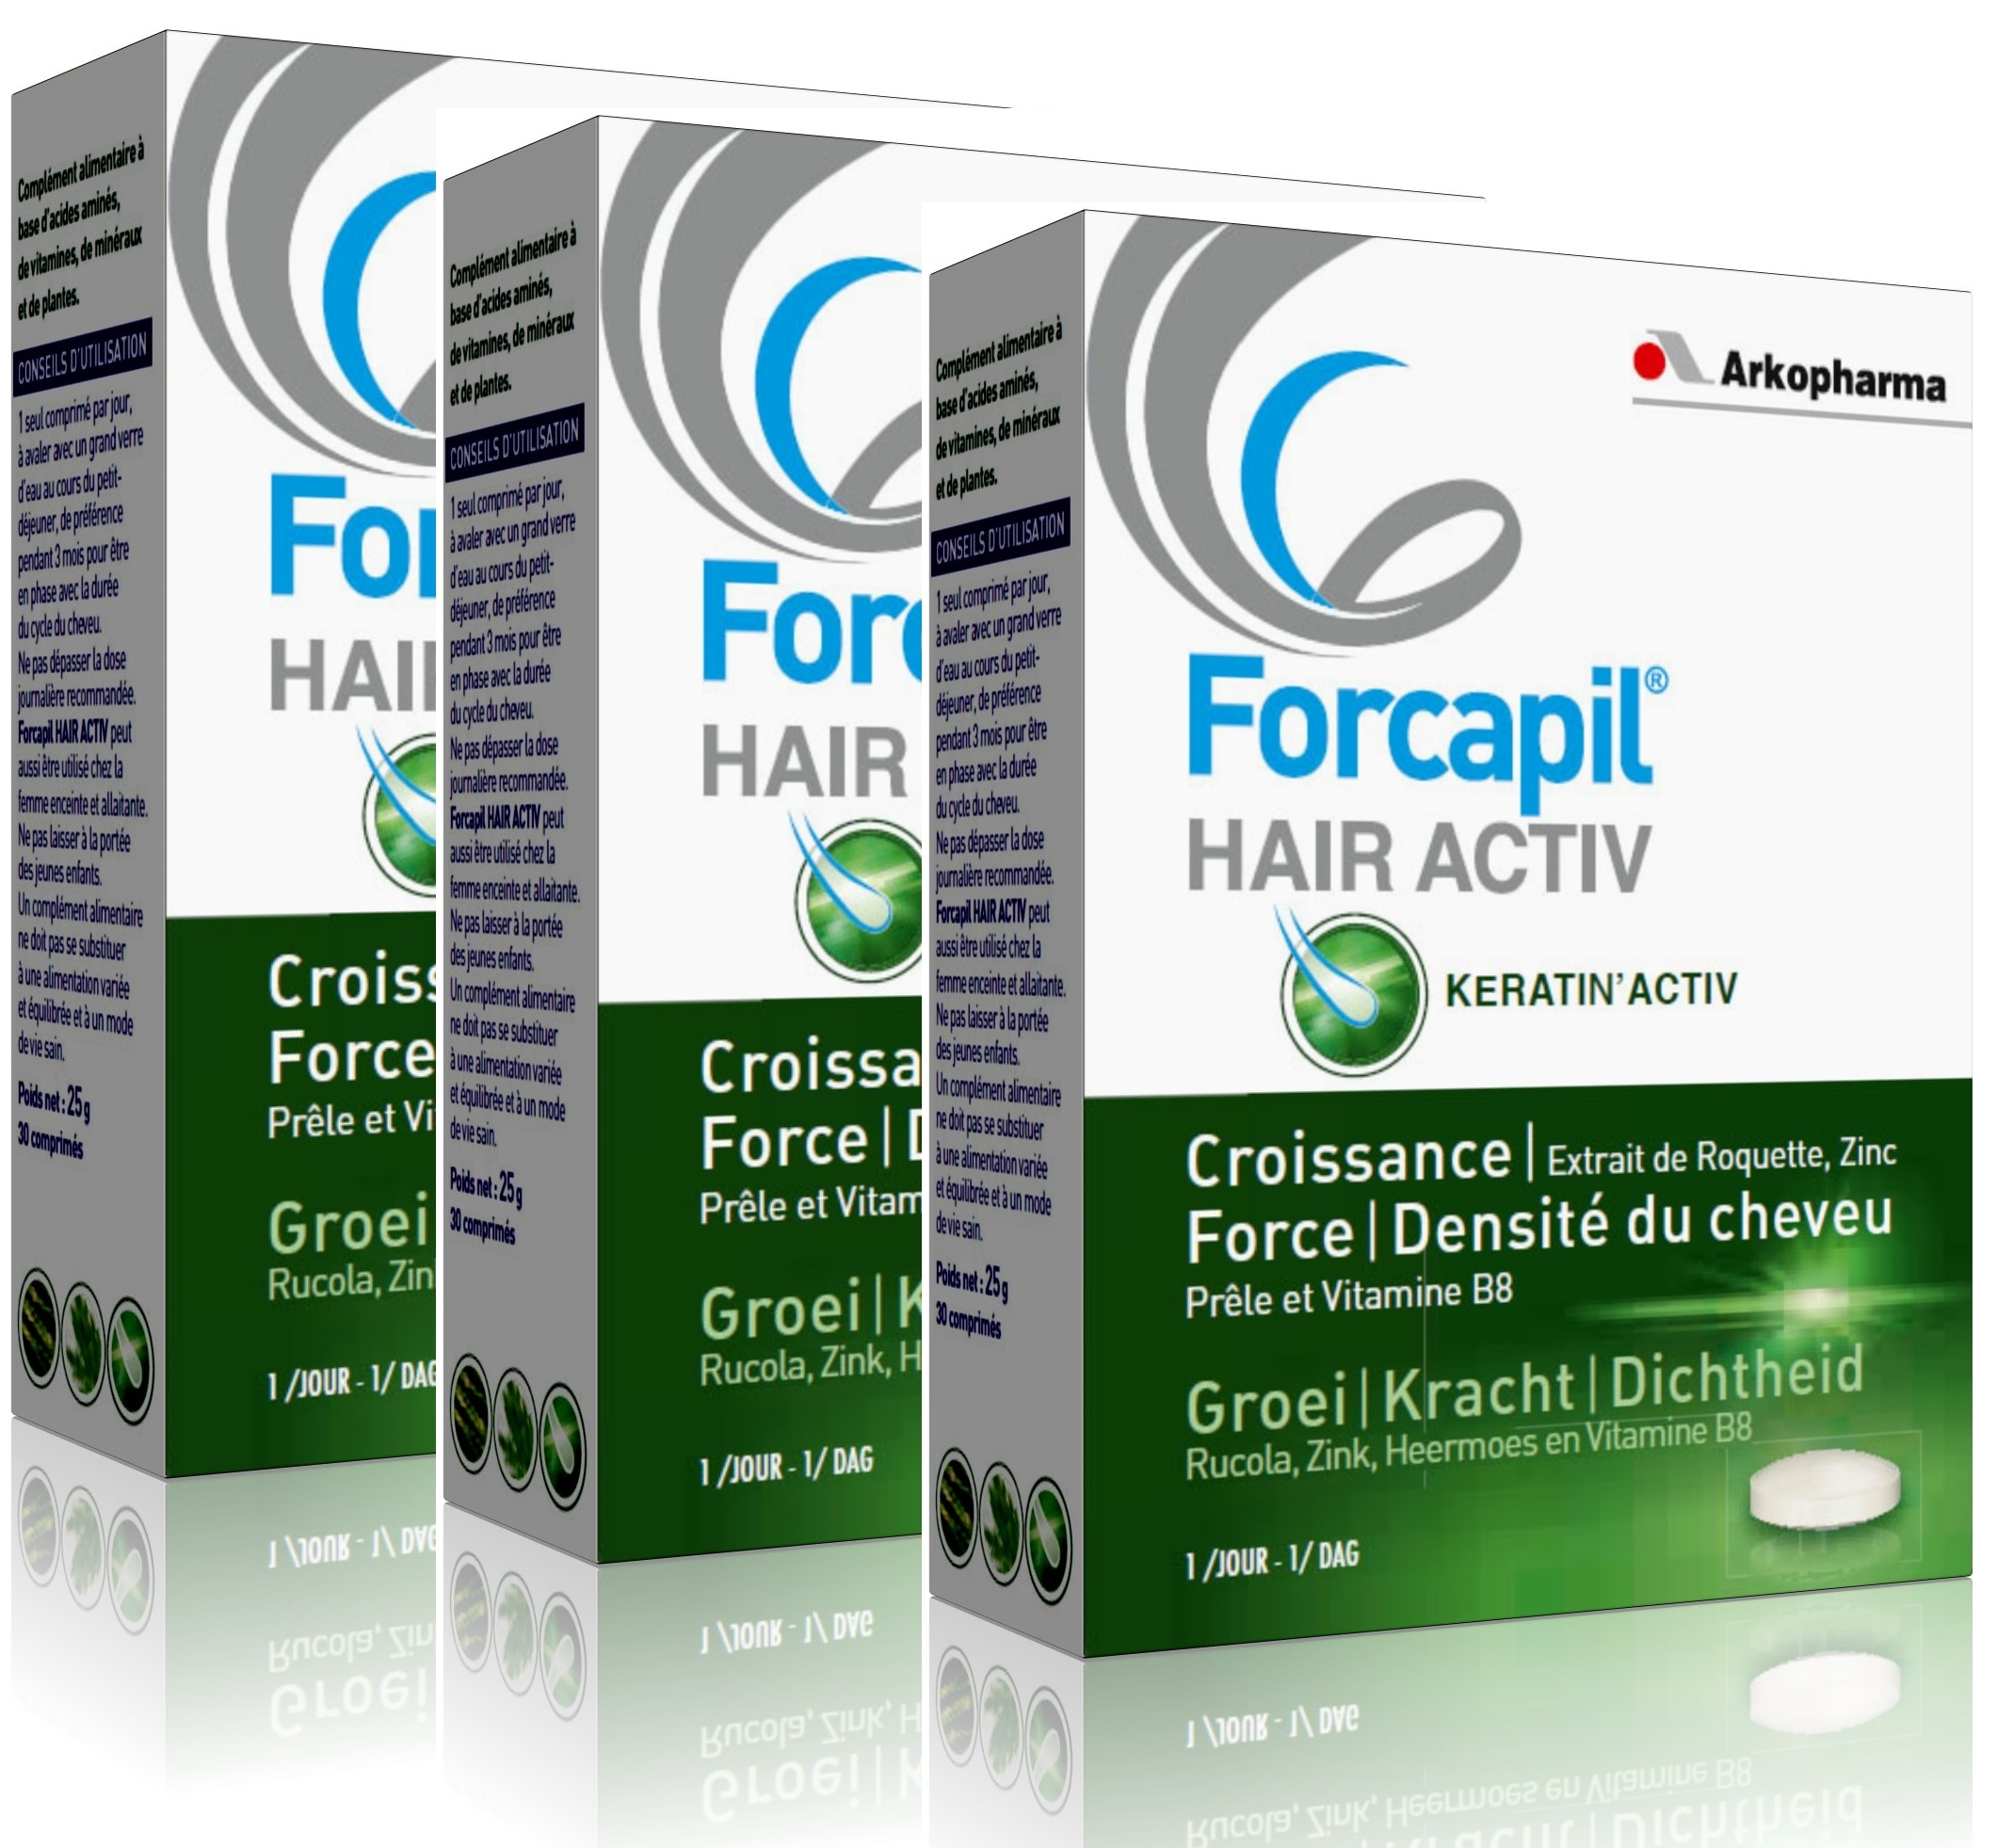 Arkopharma C - Forcapil Hair Activ Programme Intensif 3